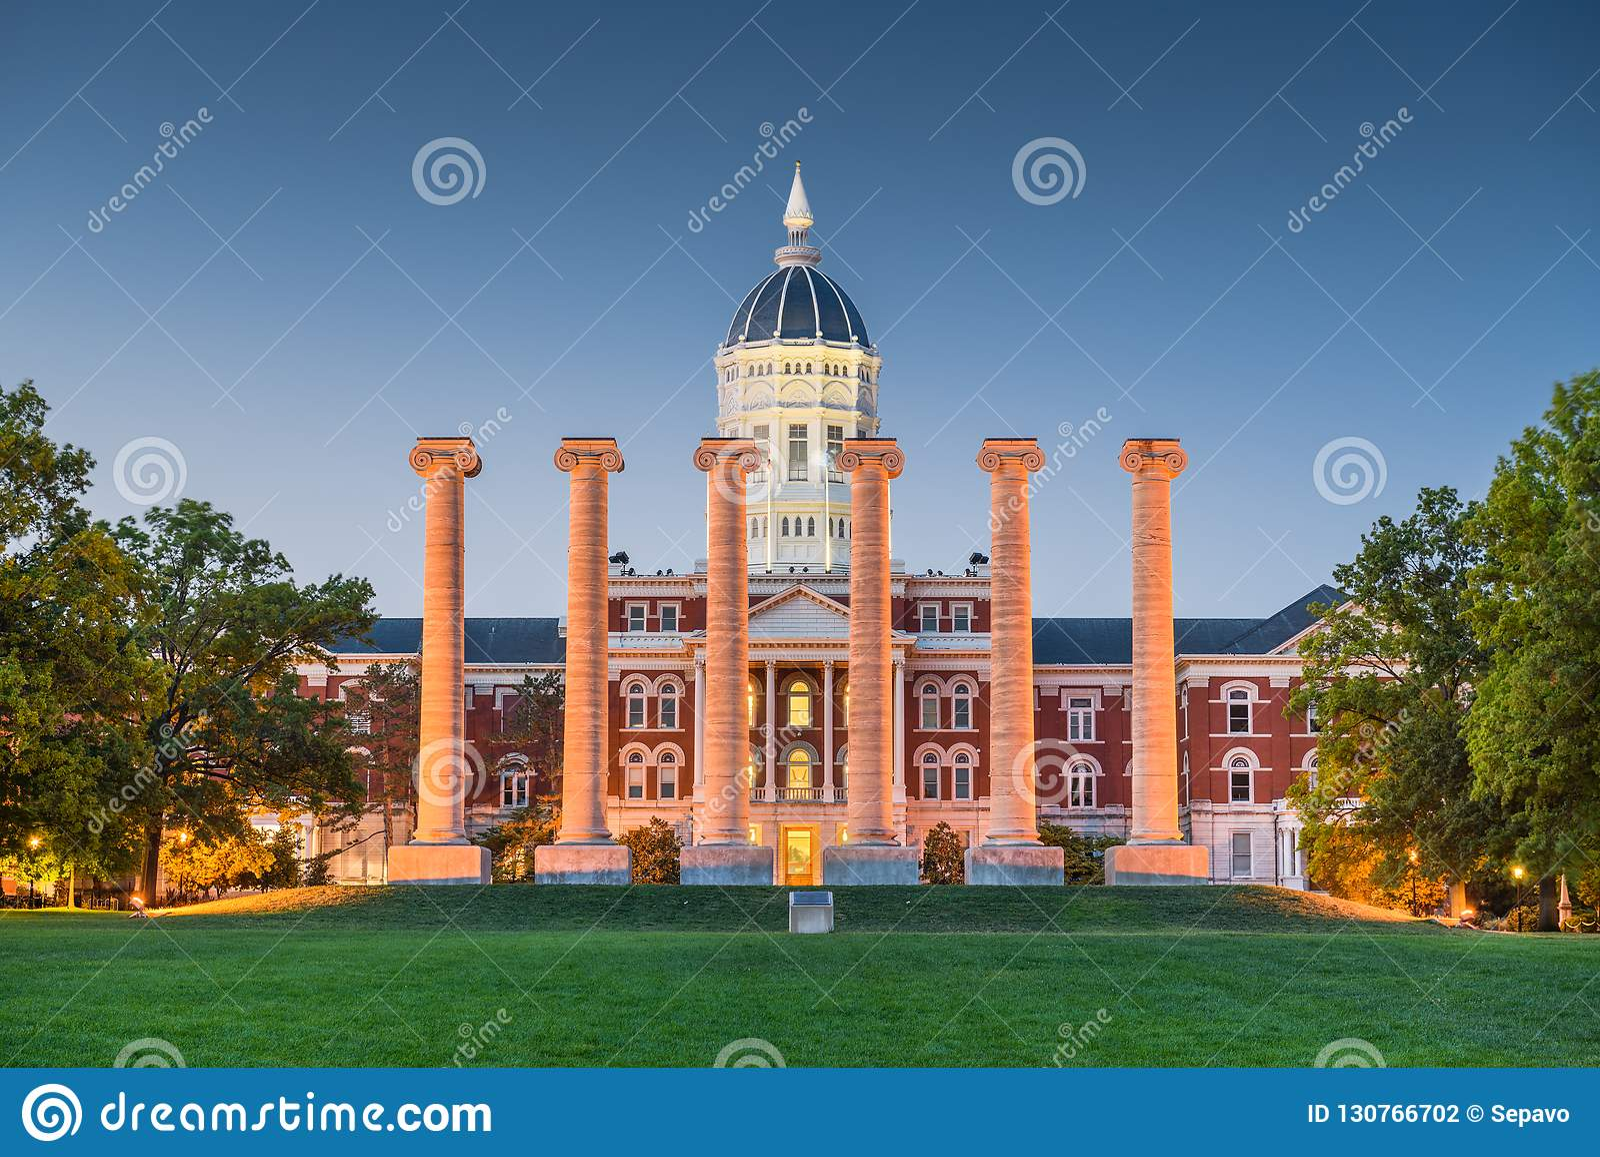 De historische campus van Colombia, Missouri, de V.S.